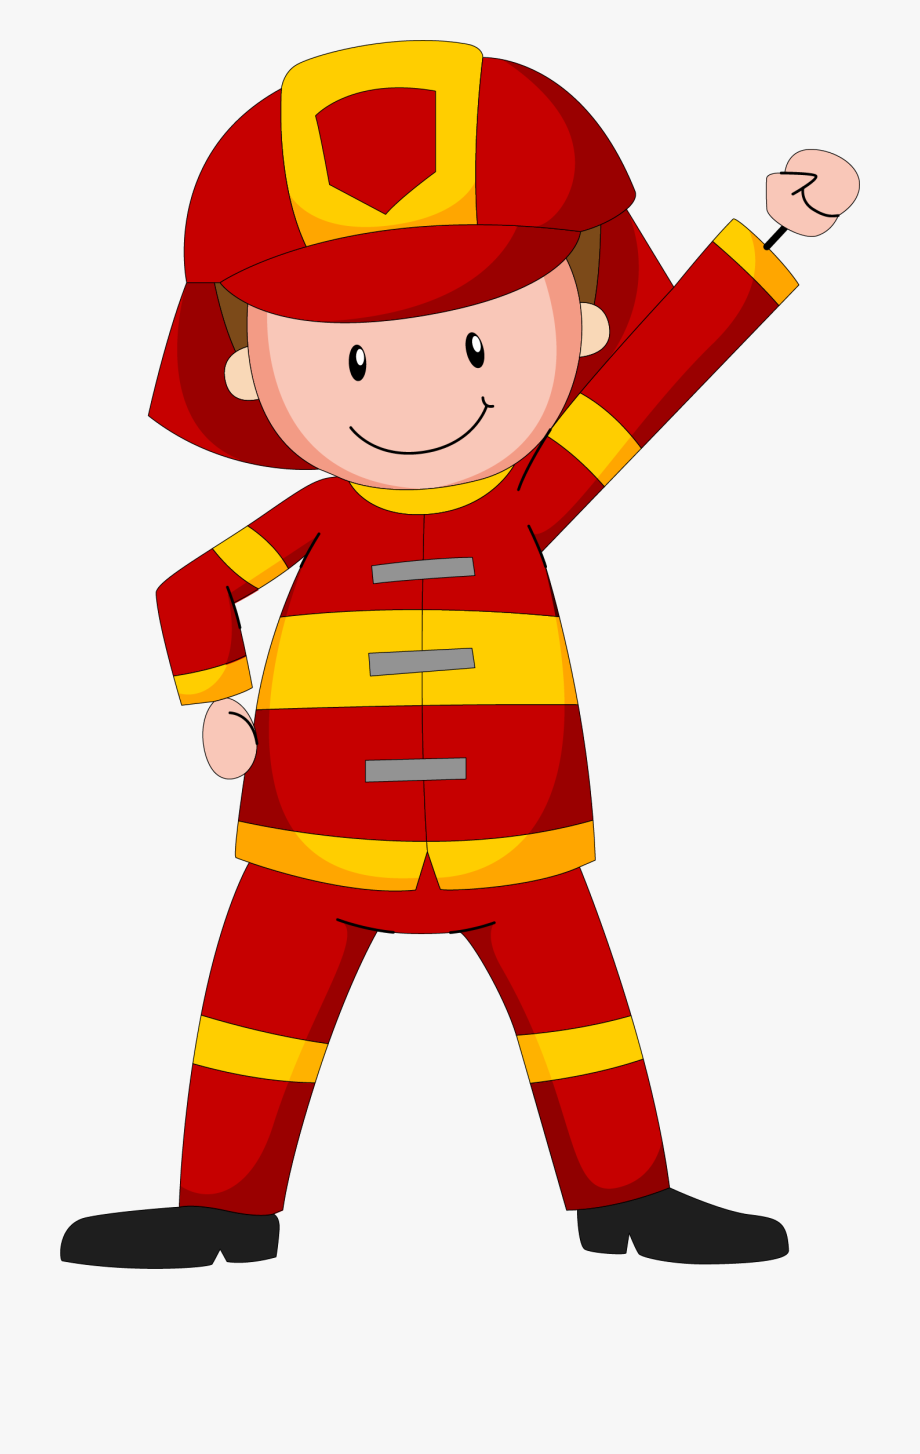 Fireman clipart kid. Transprent png free download